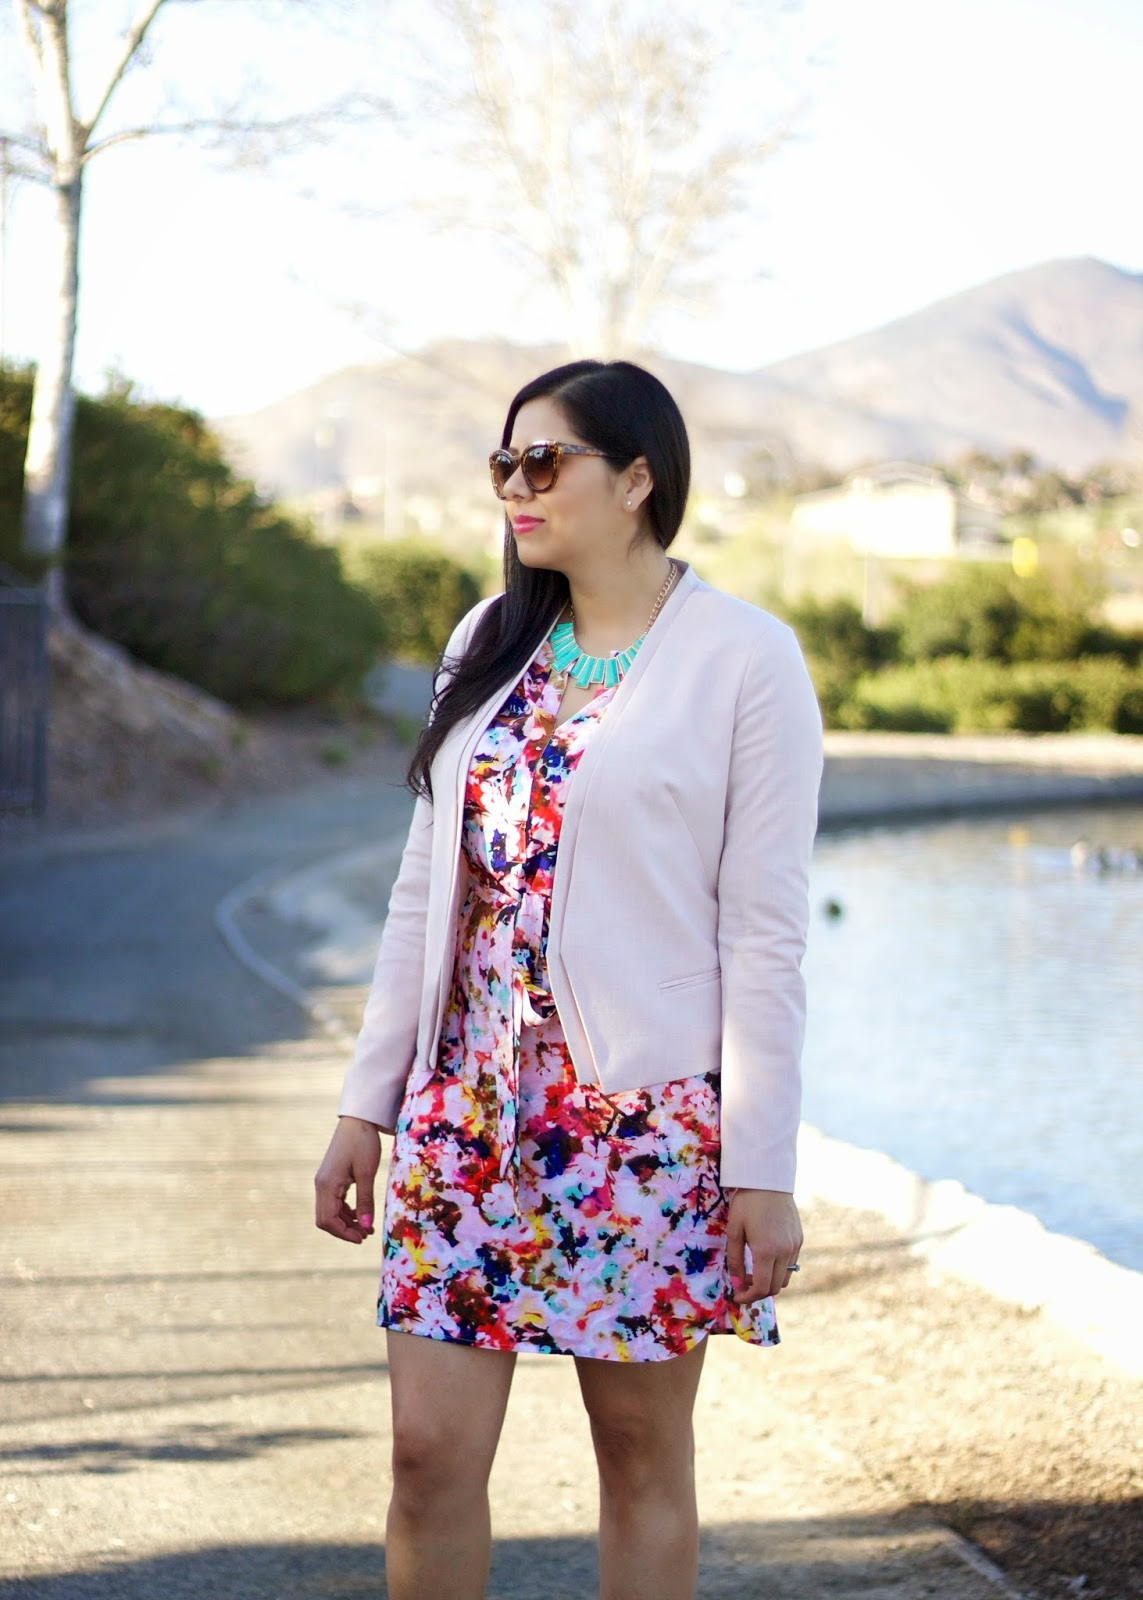 Pastel Pink Blazer, Pink Pastels, jcpstyle, jc penney, florals for spring, floral shirt dress, nude heels, charlotte russe nude heels